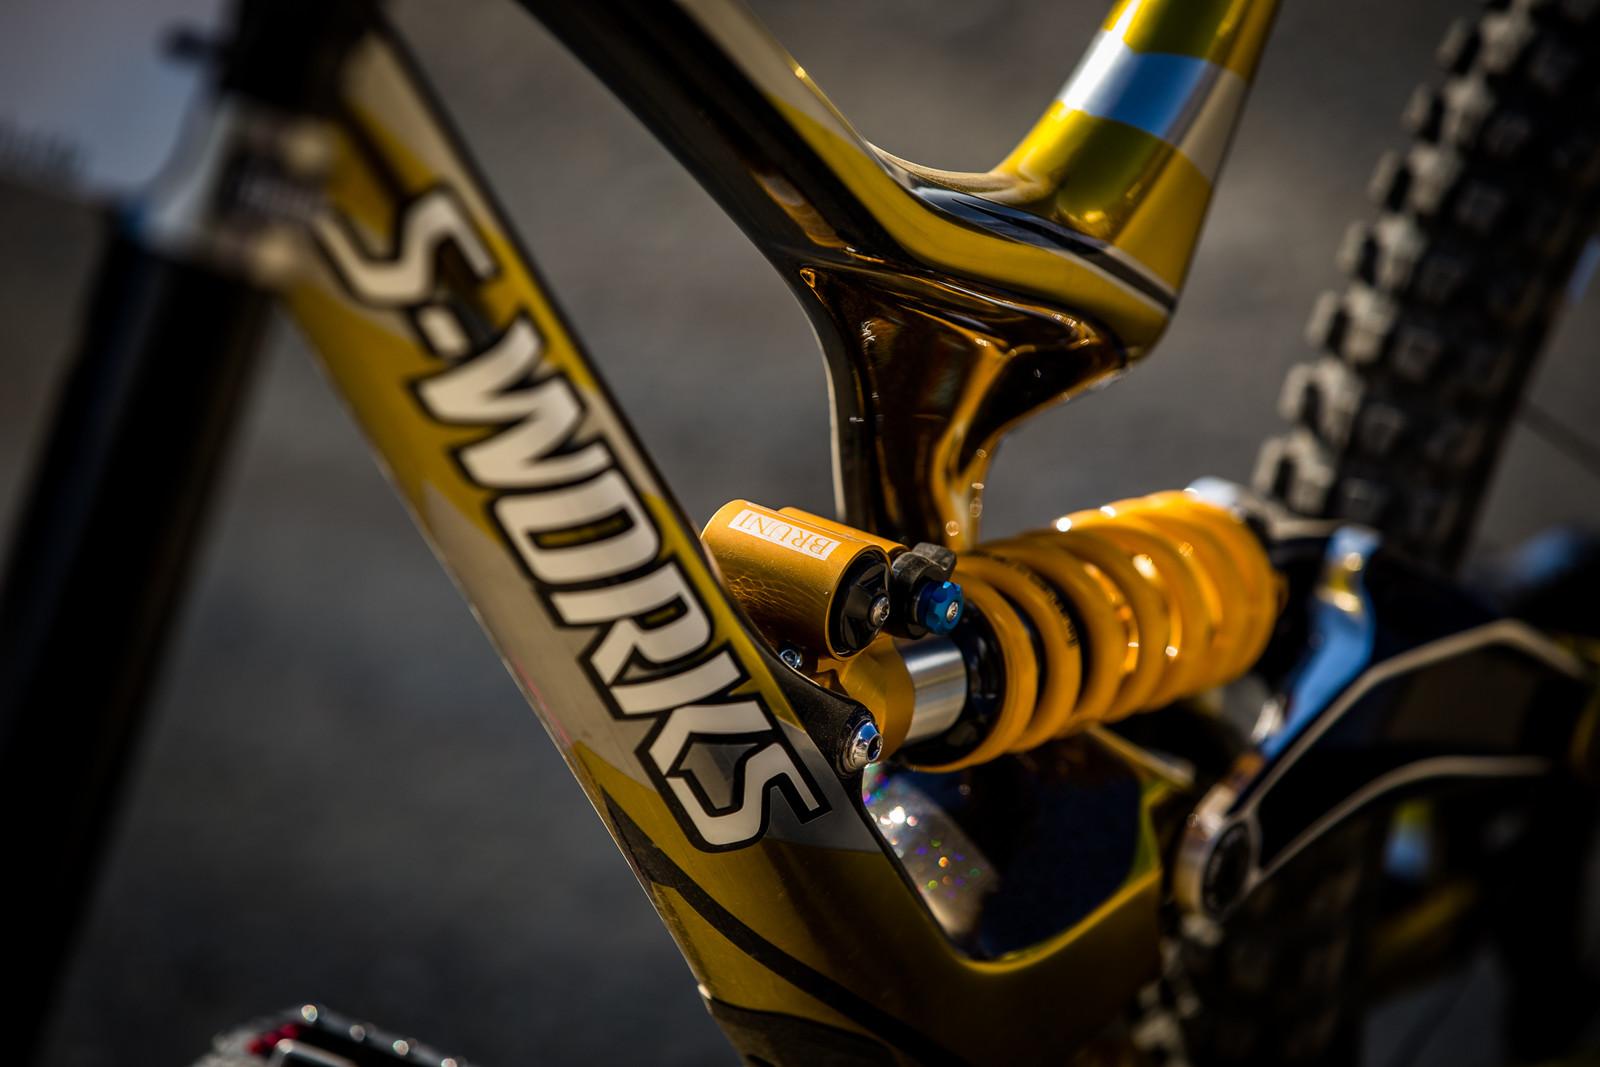 Shiny - WINNING BIKE - Loic Bruni's Specialized Demo - Mountain Biking Pictures - Vital MTB